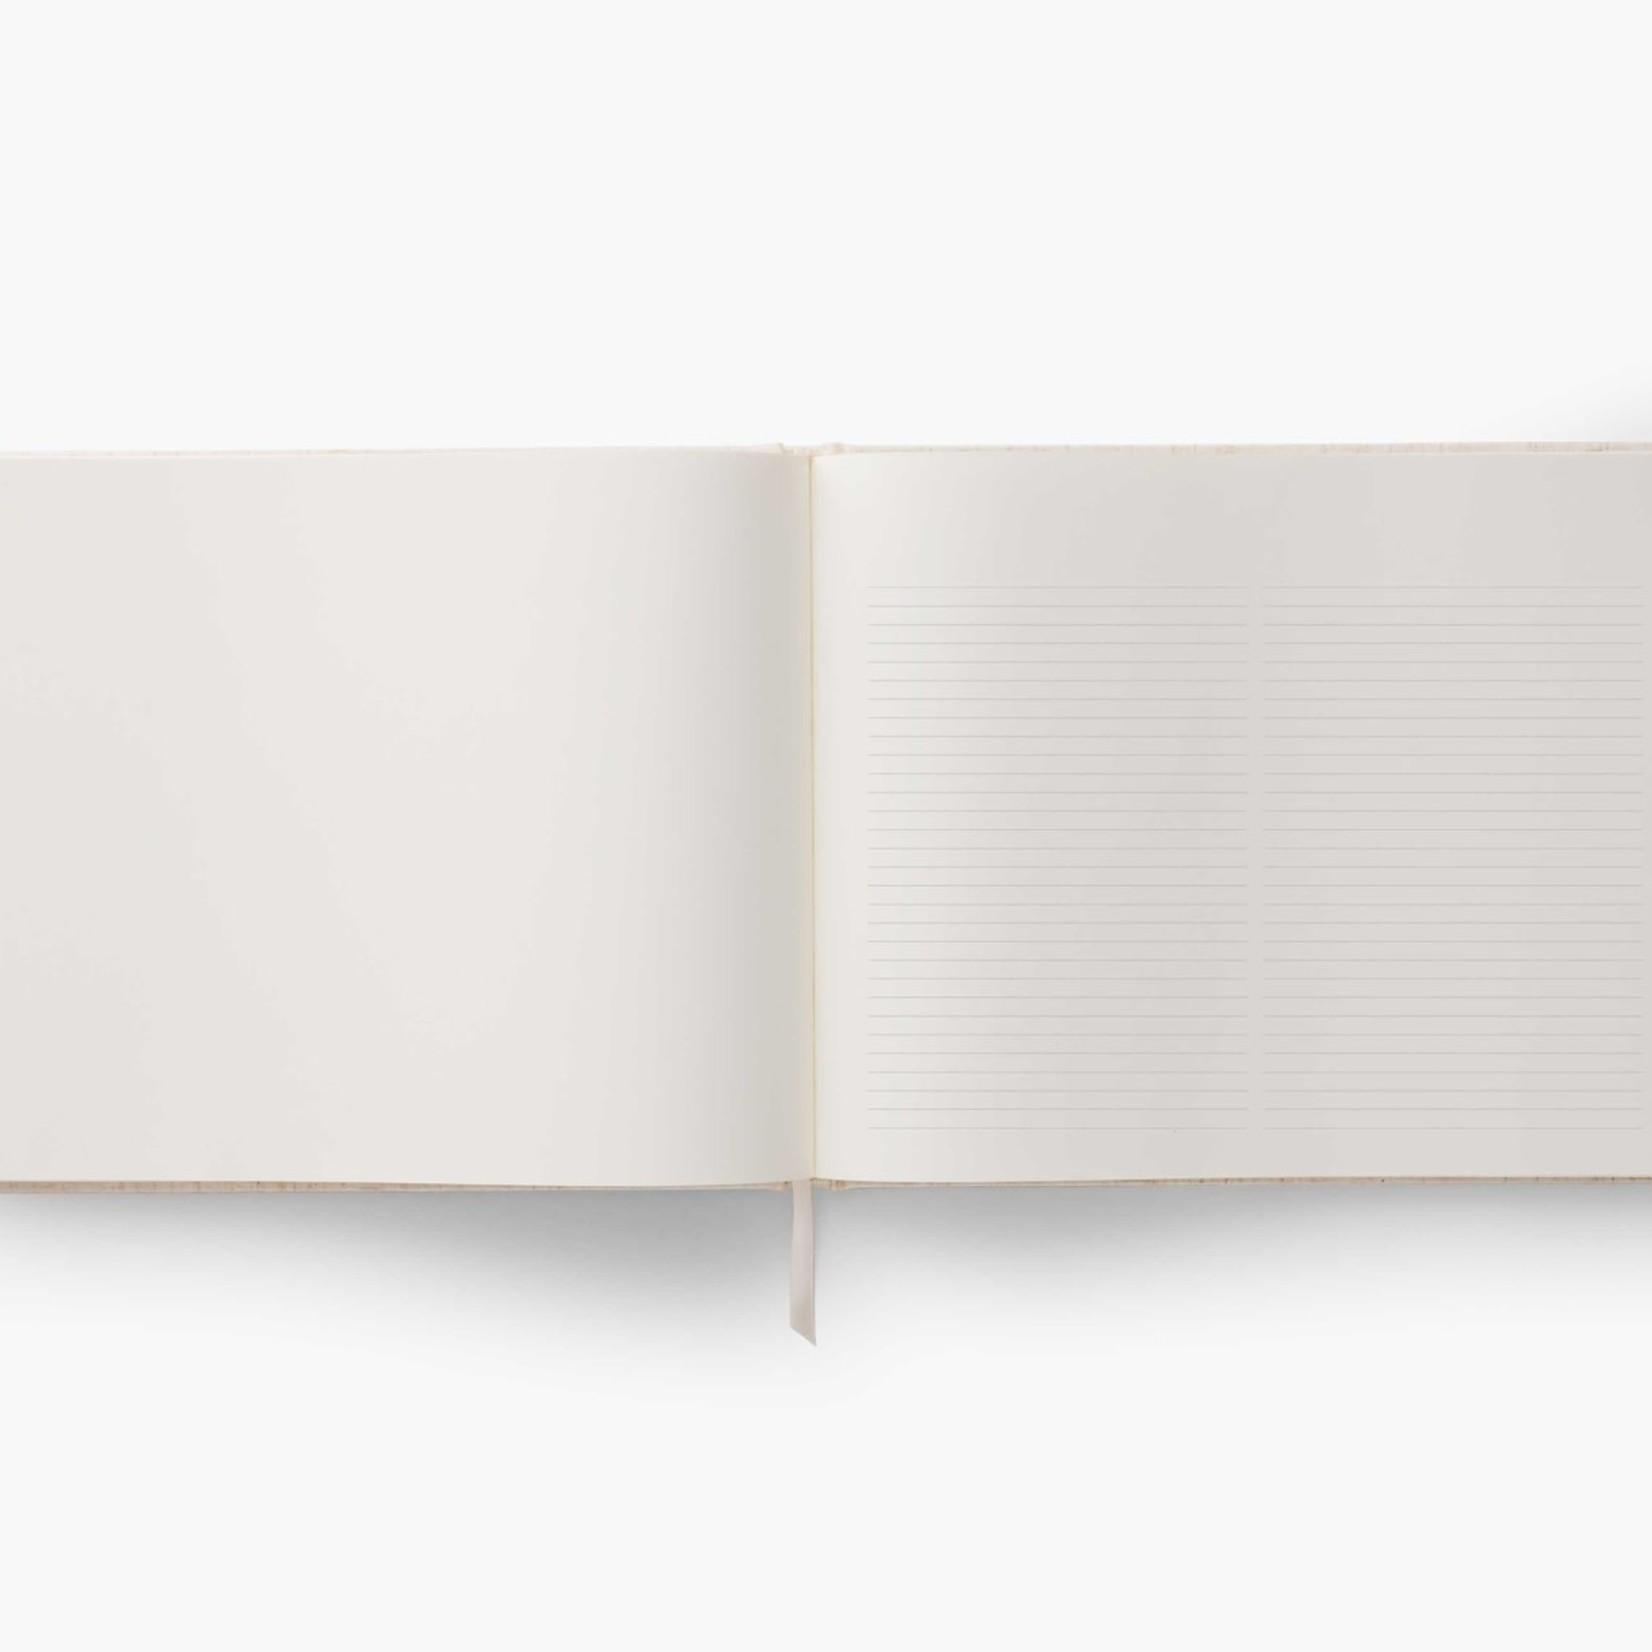 Wildwood Emdriodered Guest Book